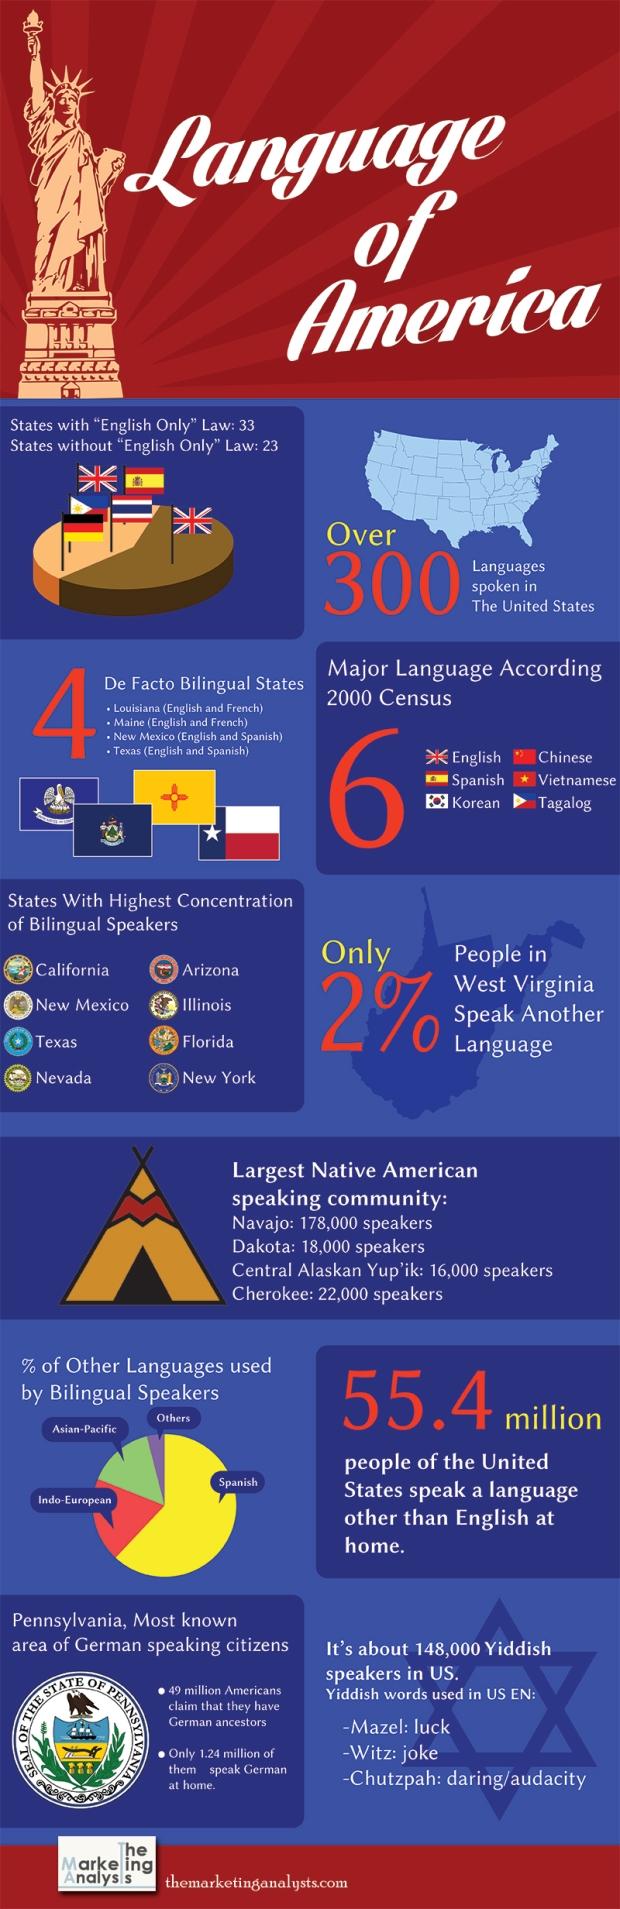 language-of-america_525f40952bb33